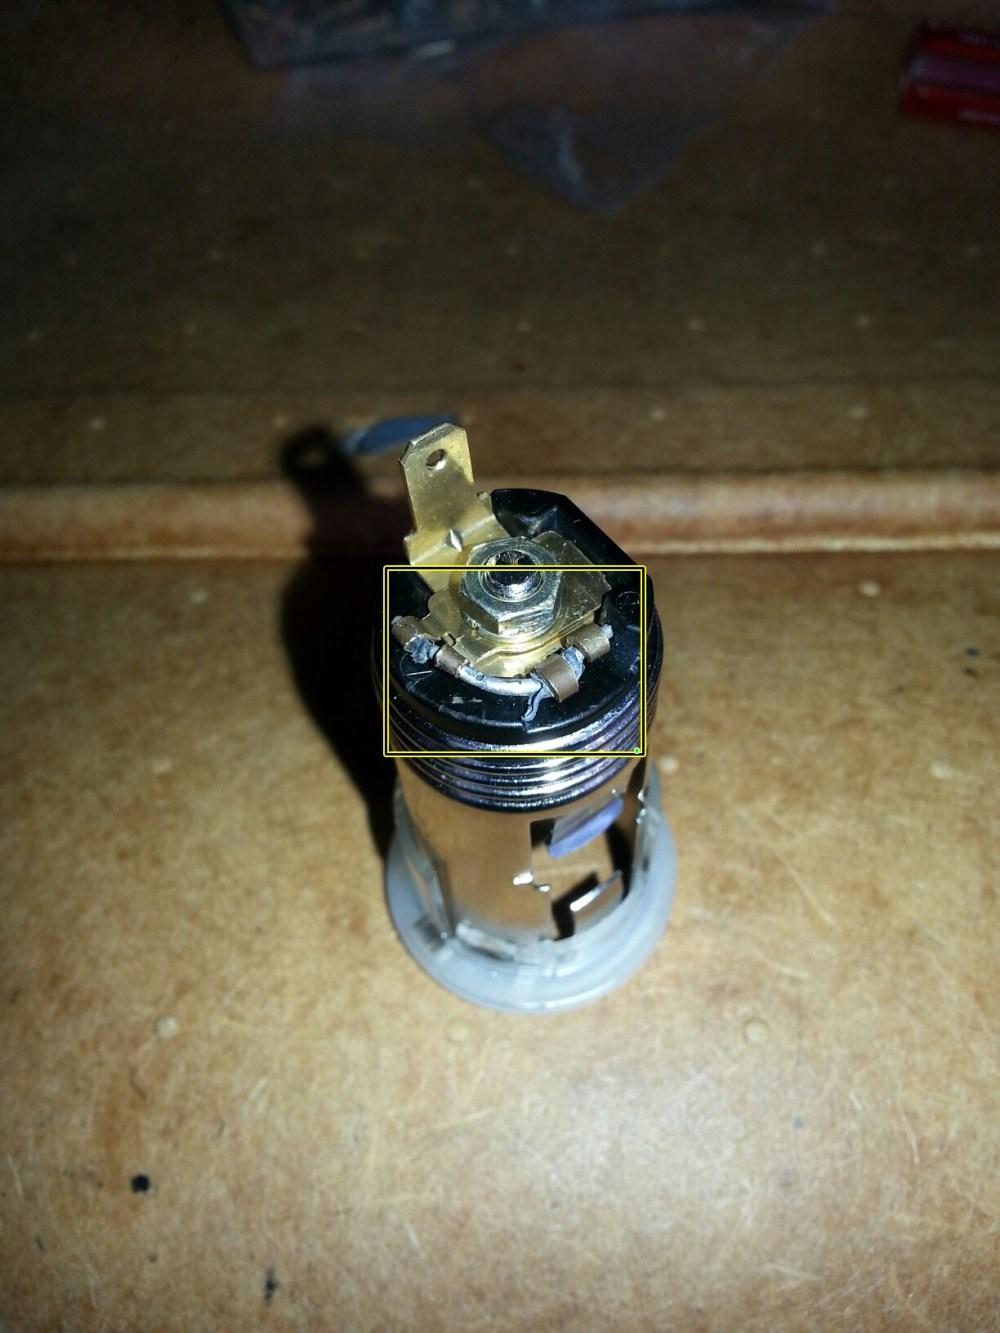 medium resolution of lexus lighter fail safe jpeg